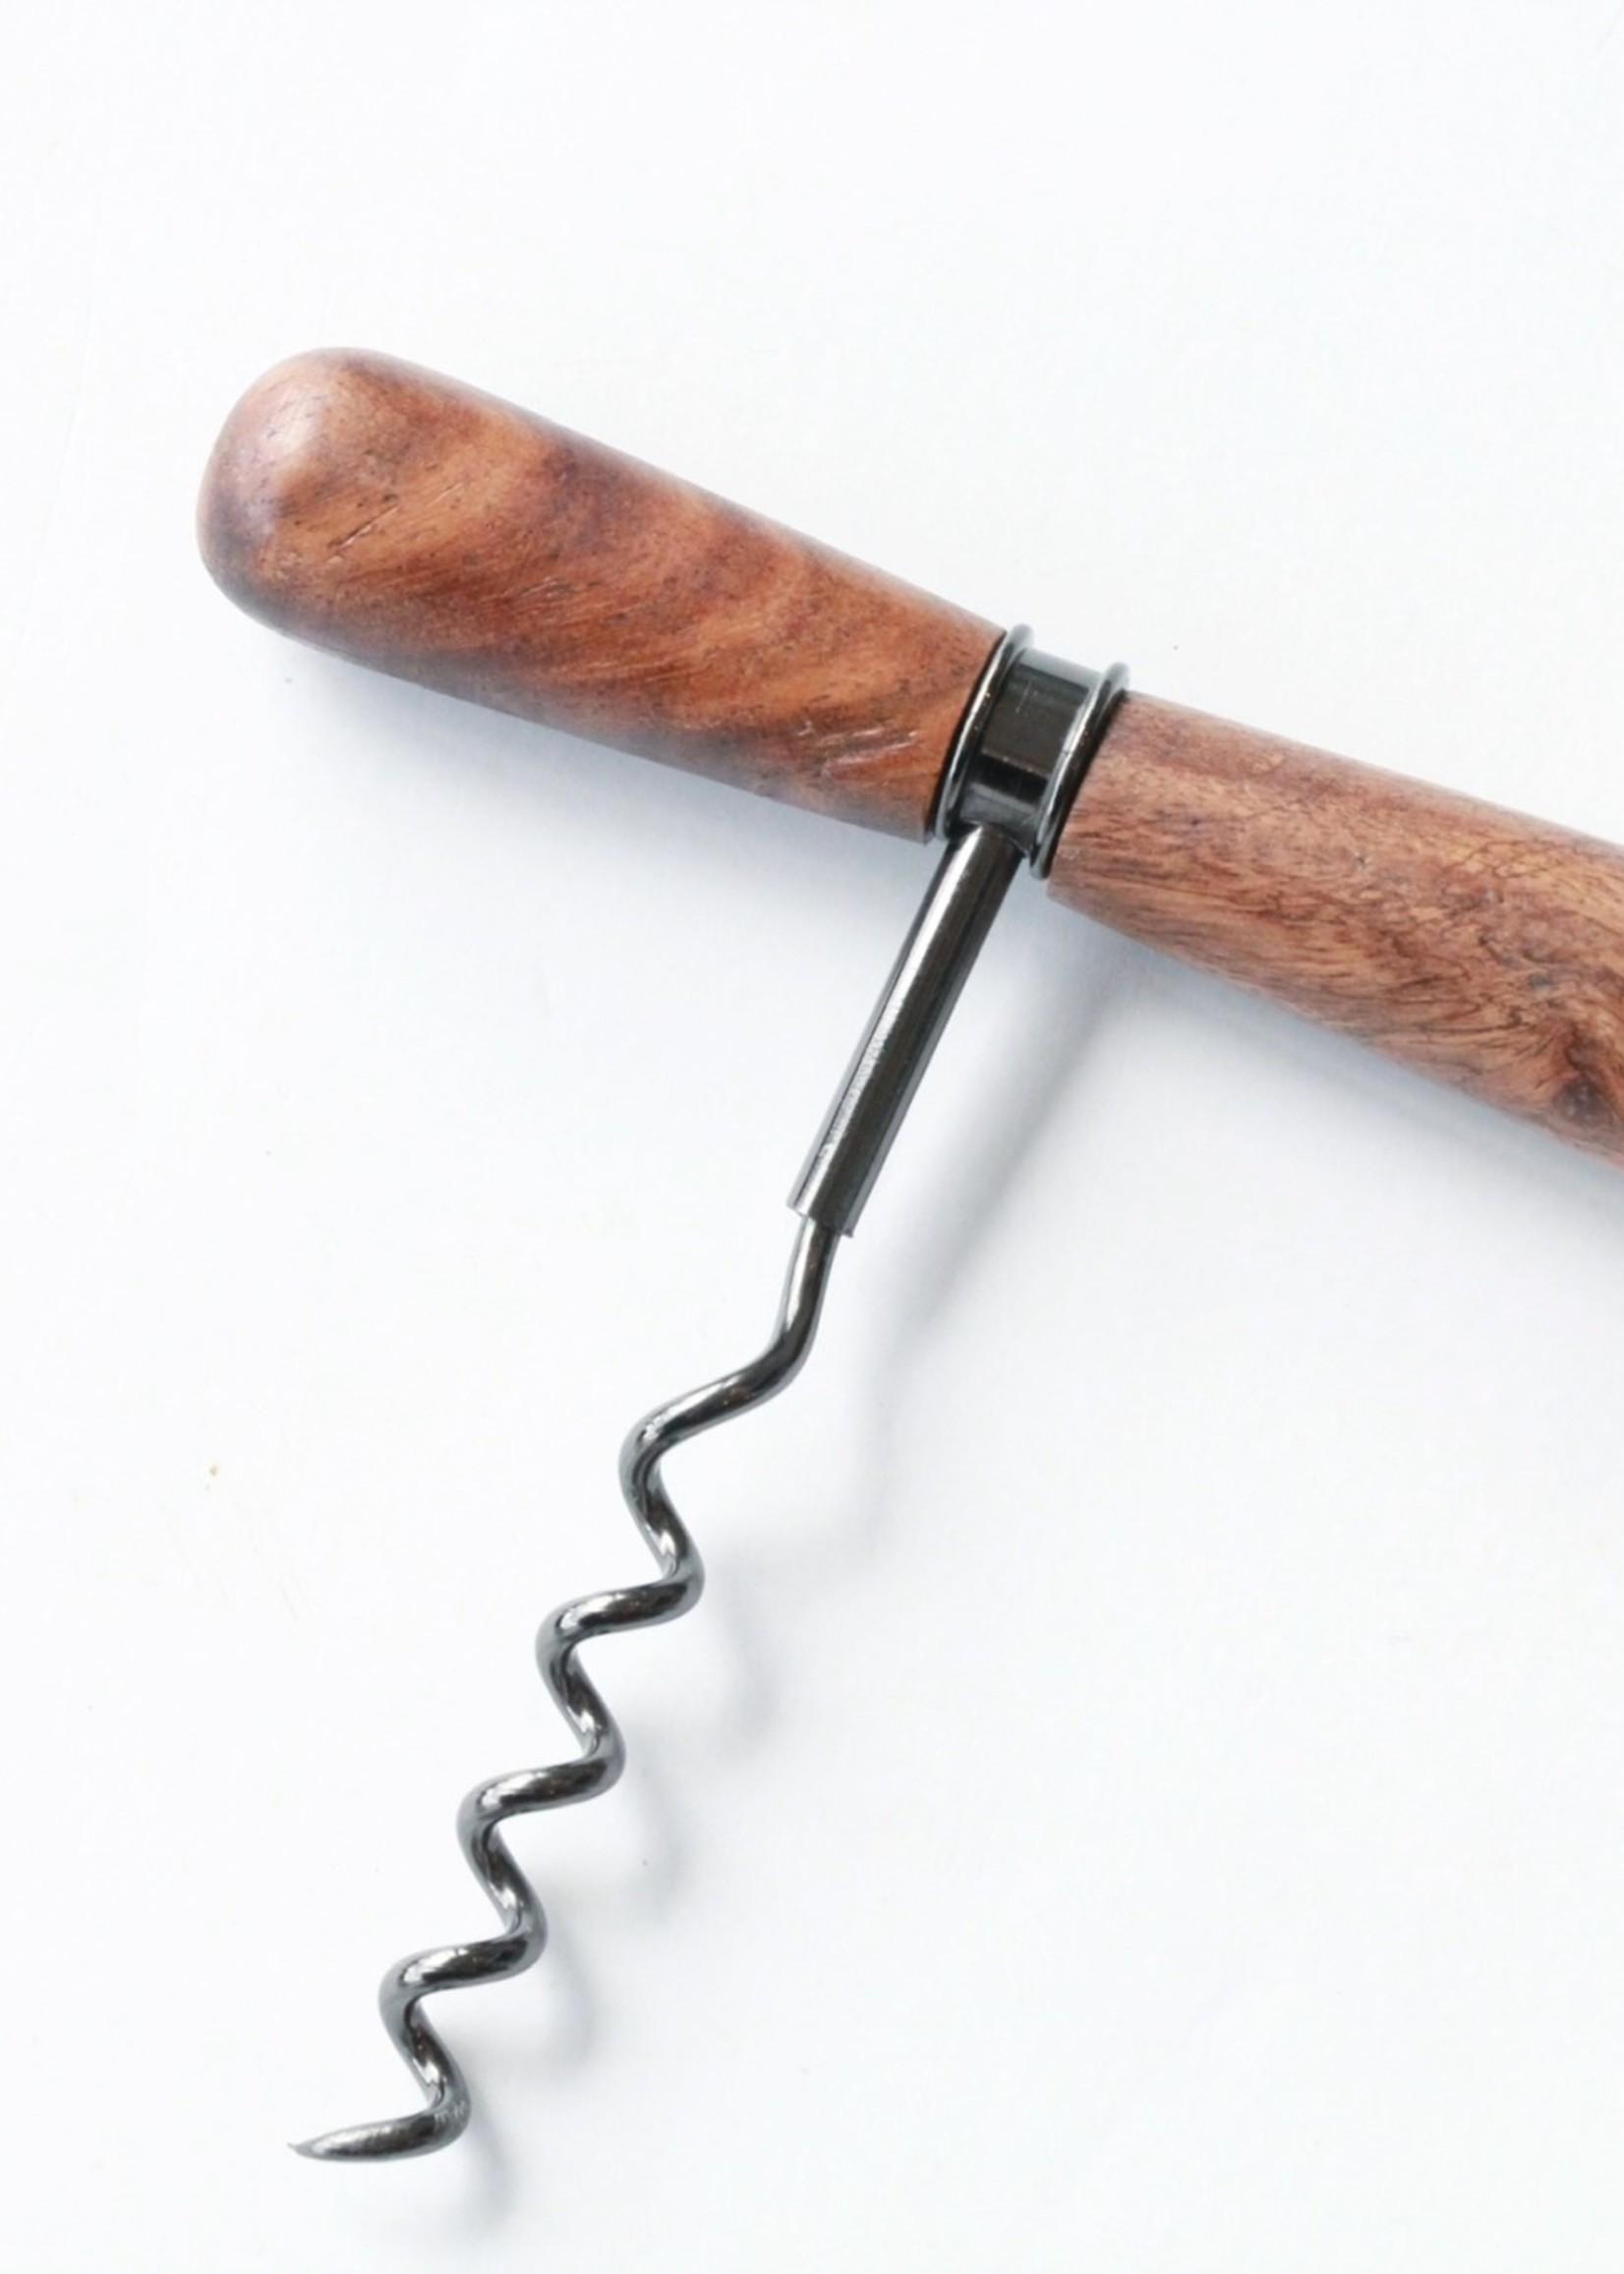 Onyx and Wood Corkscrew